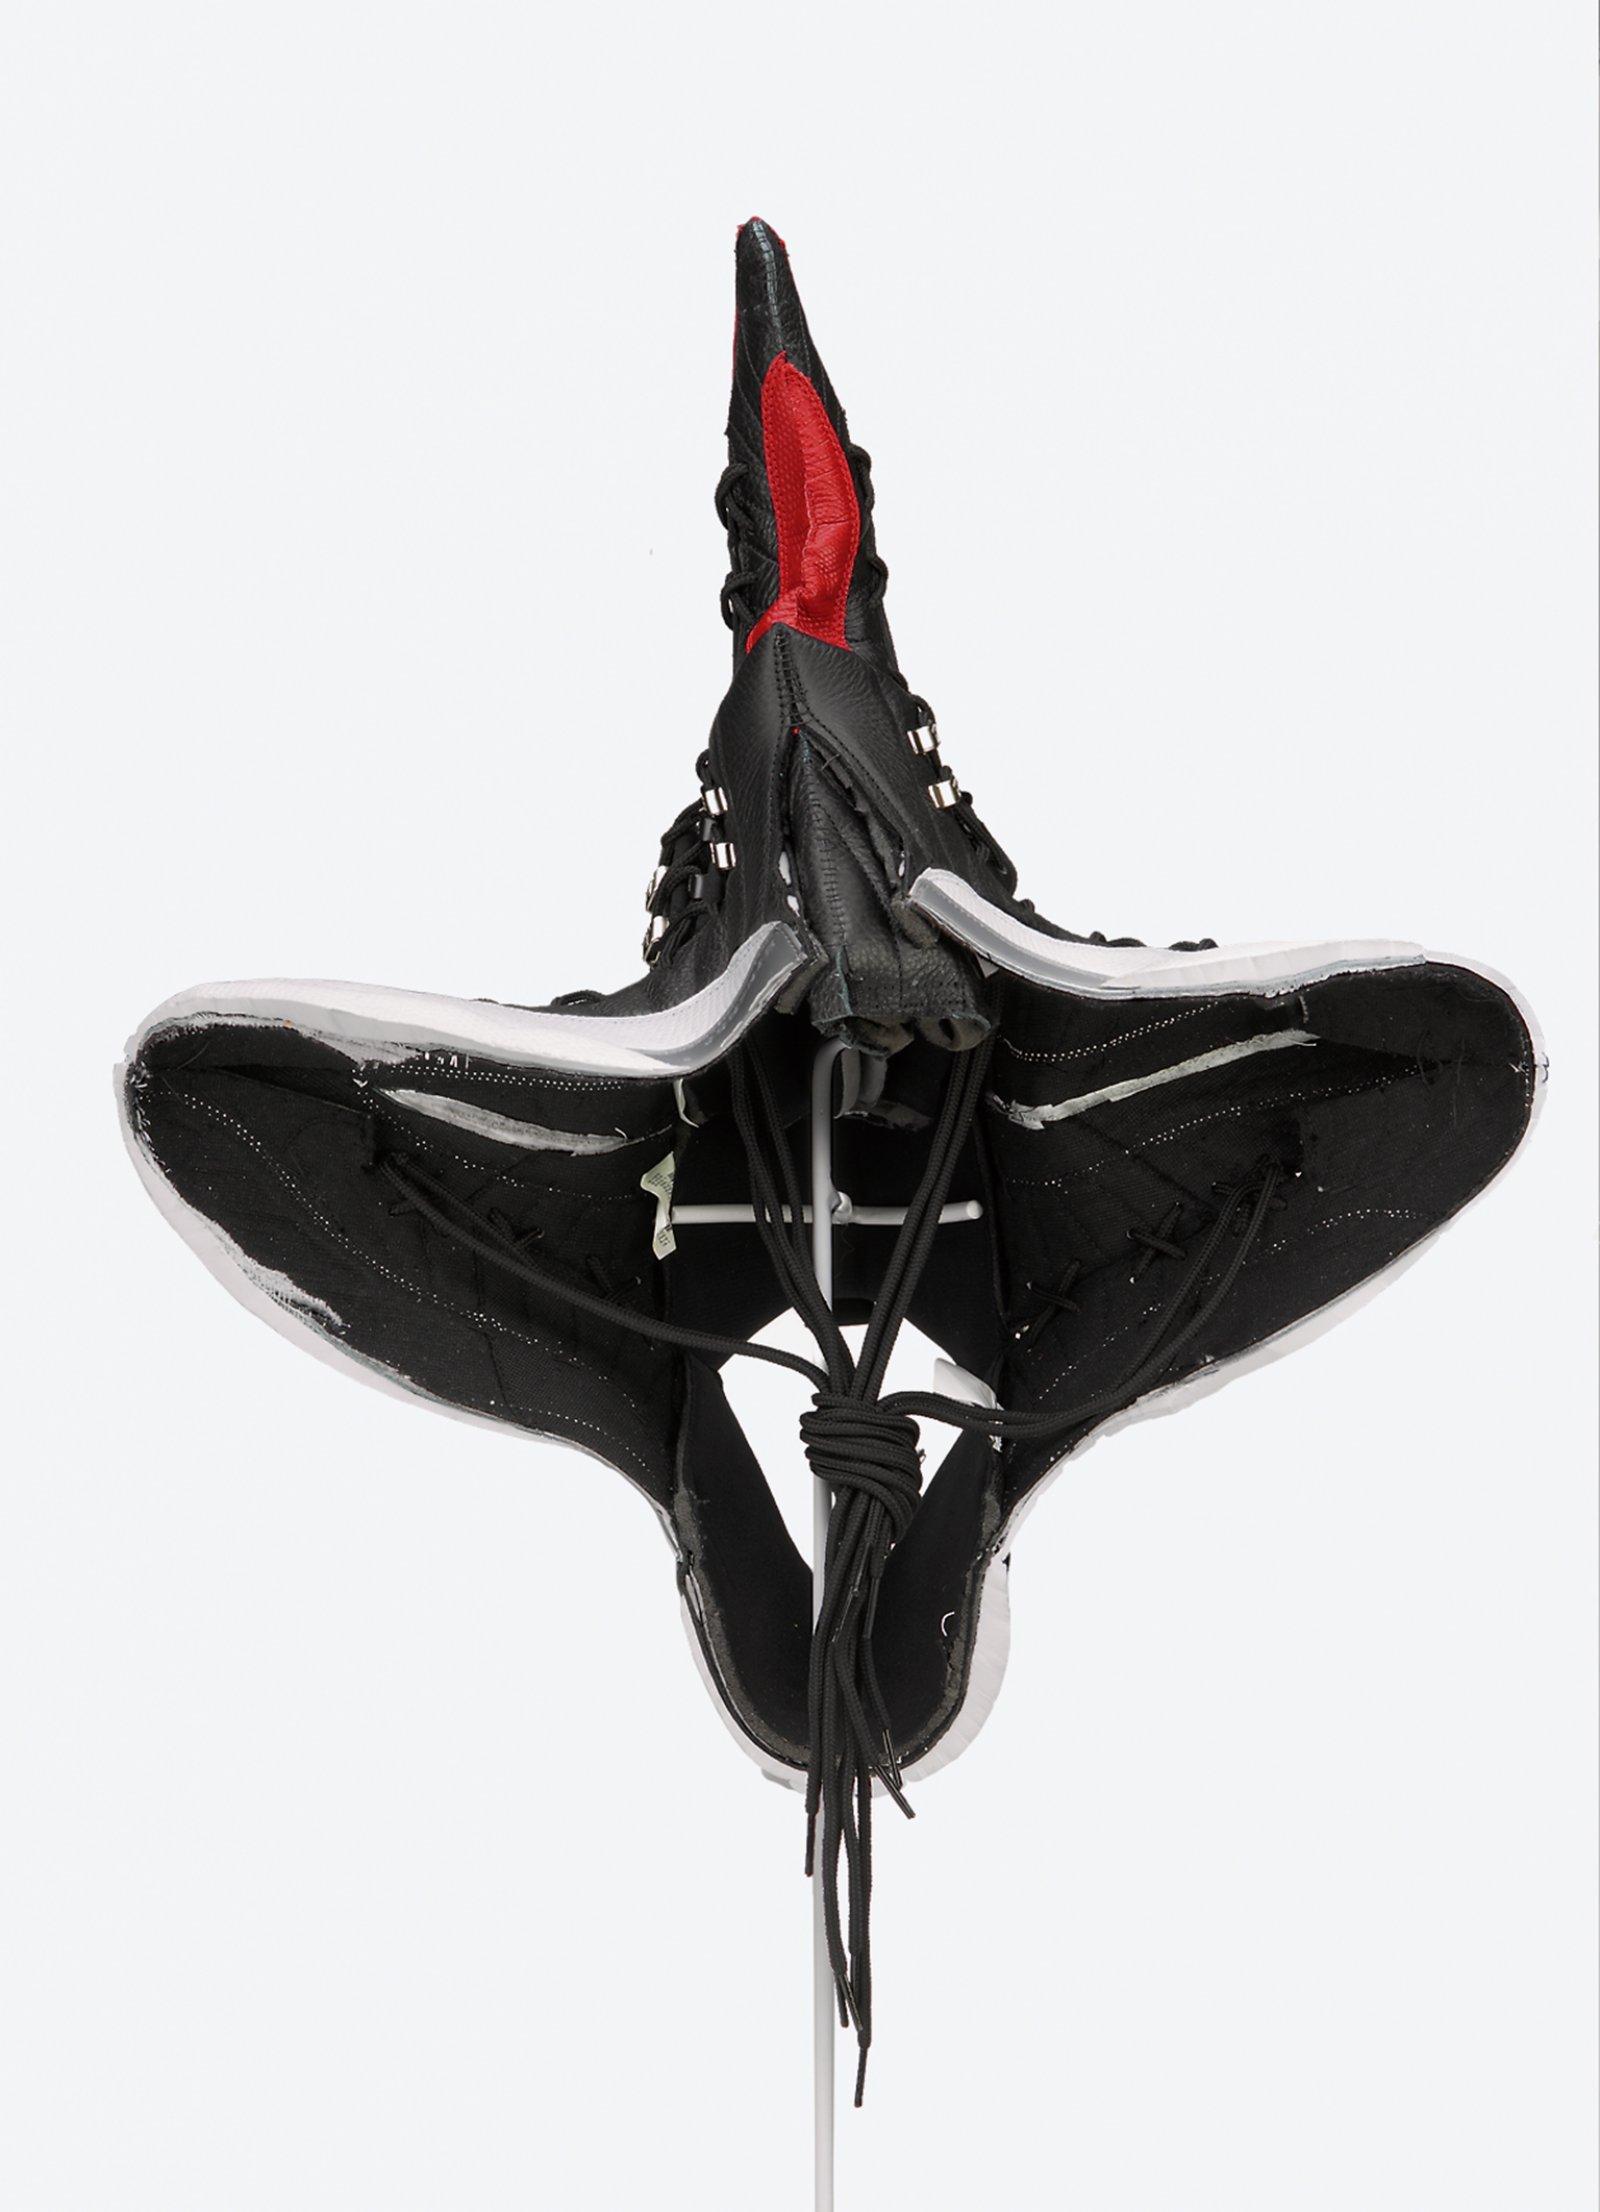 Brian Jungen,Prototype for New Understanding #15, 2003, nike air jordans, human hair, 25 x 19 x 19in. (64 x 49 x 49cm)